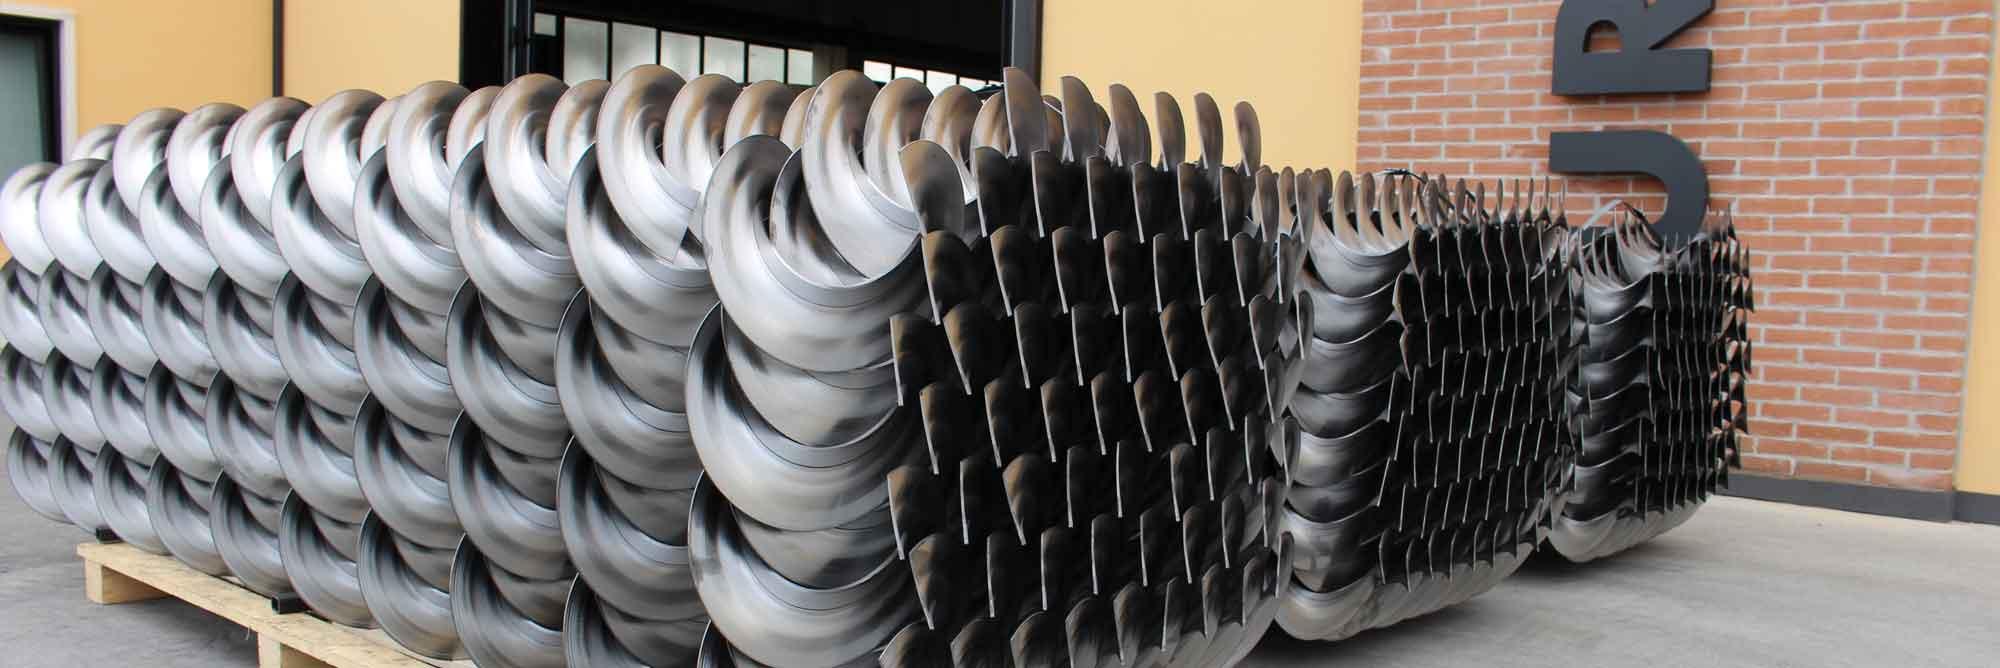 Spirali speciali per stufe e caldaie a pellet e cippato_gallery_02